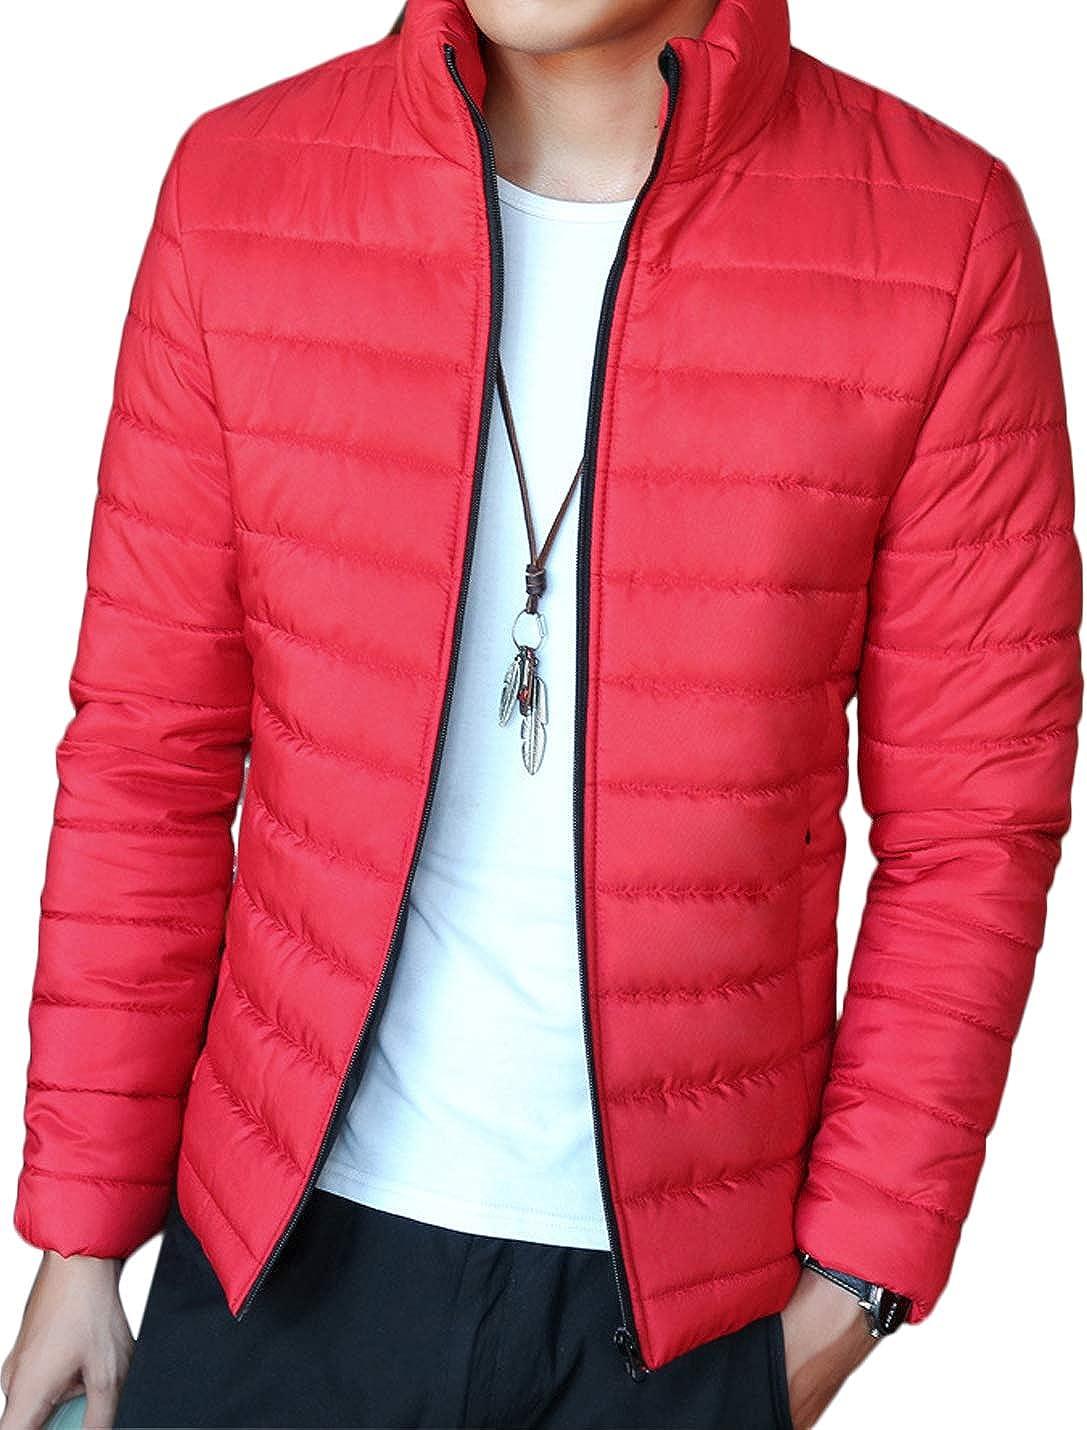 Jenkoon Men's Lightweight Down Alternative Puffer Jacket Insulated Short Coat Jacket